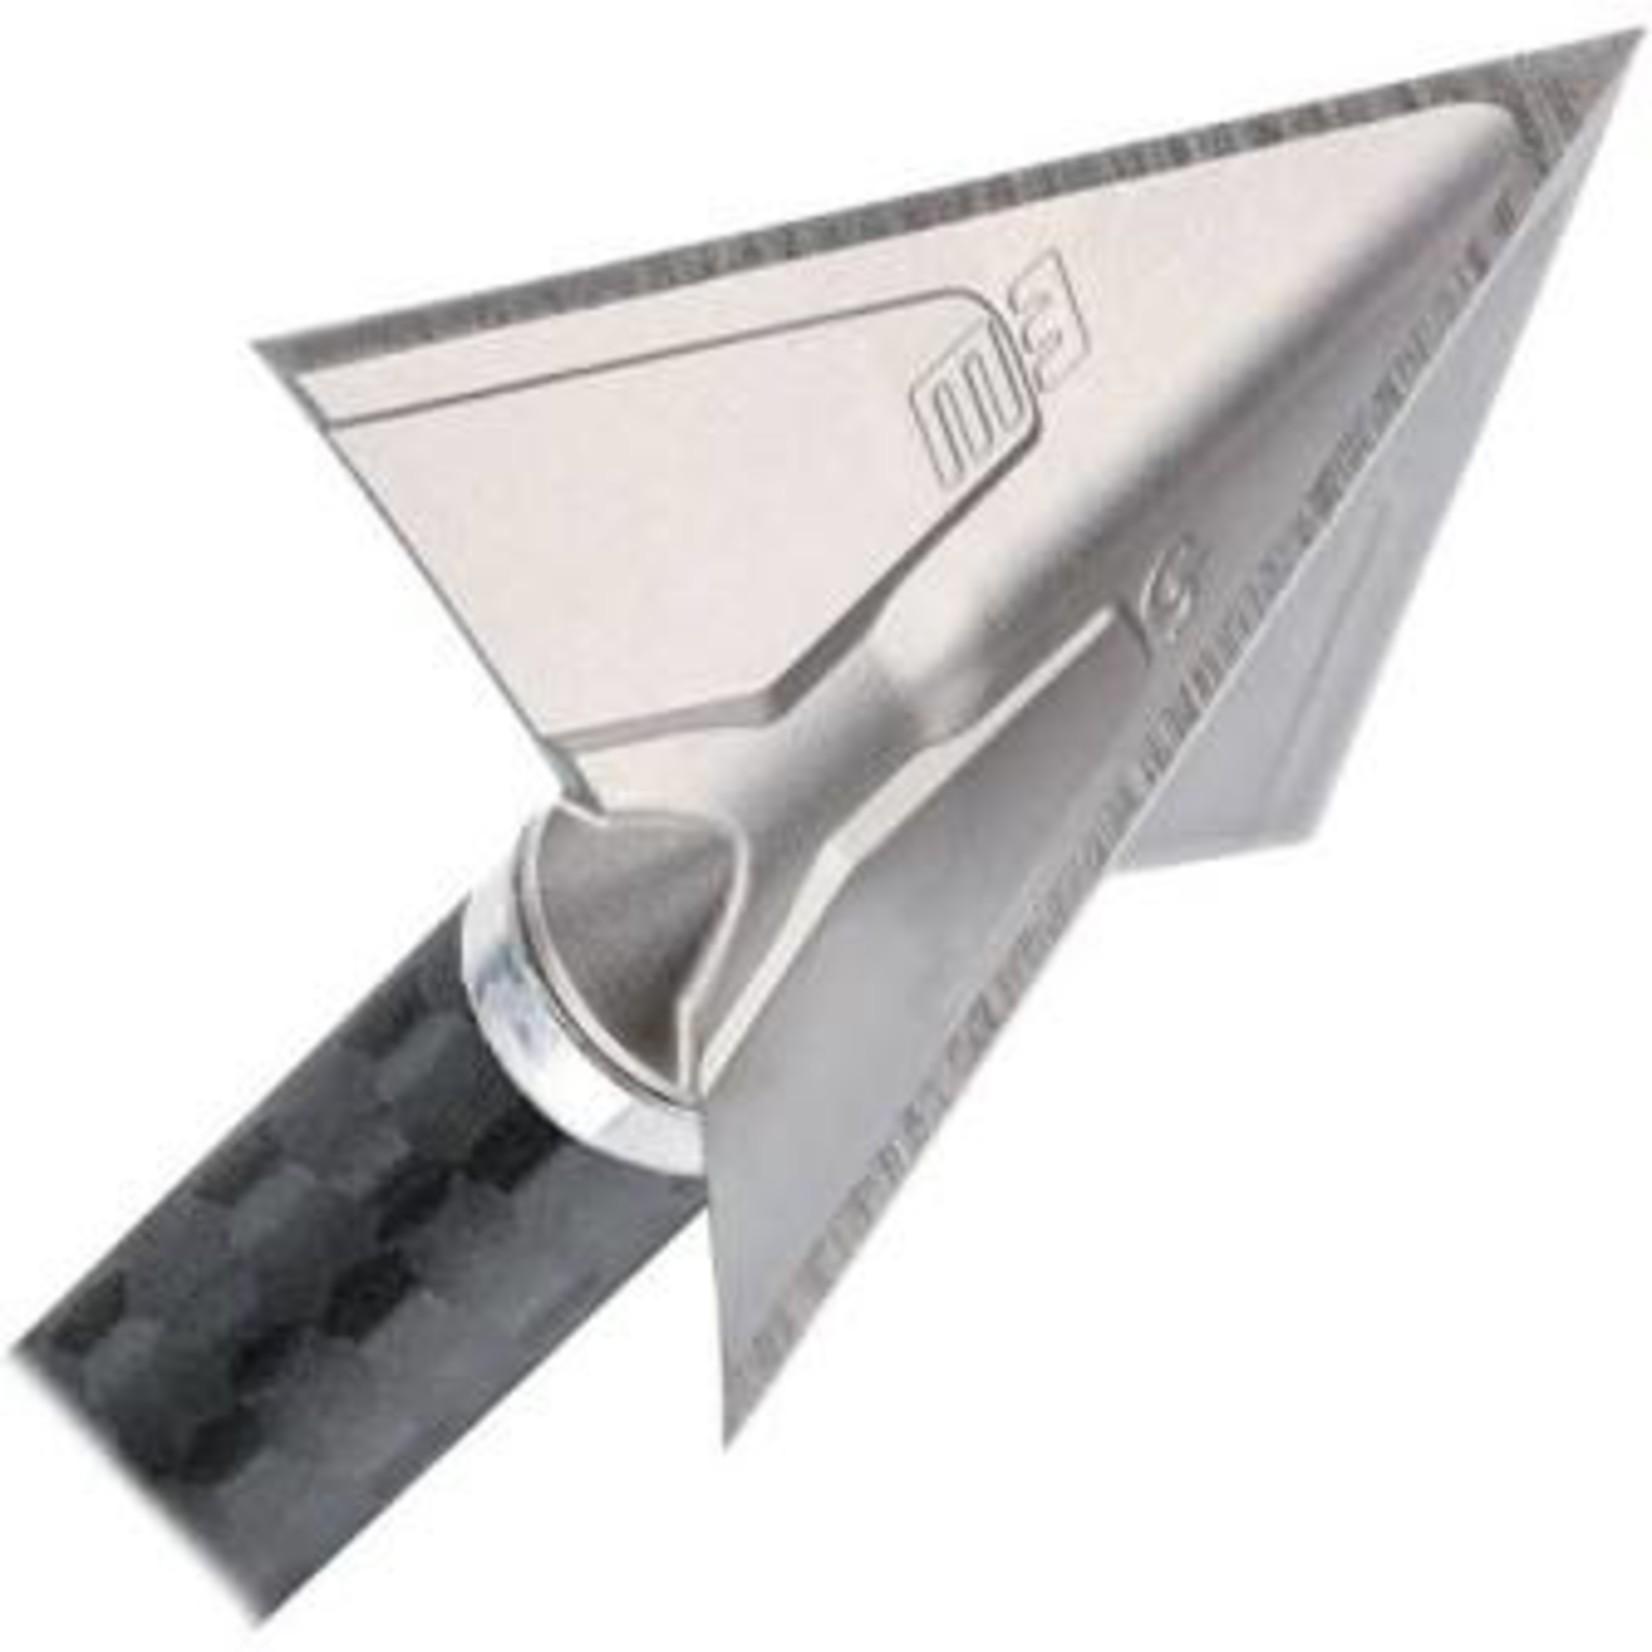 G5 Montec M3 3-Blade Fixed-Blade Broadhead